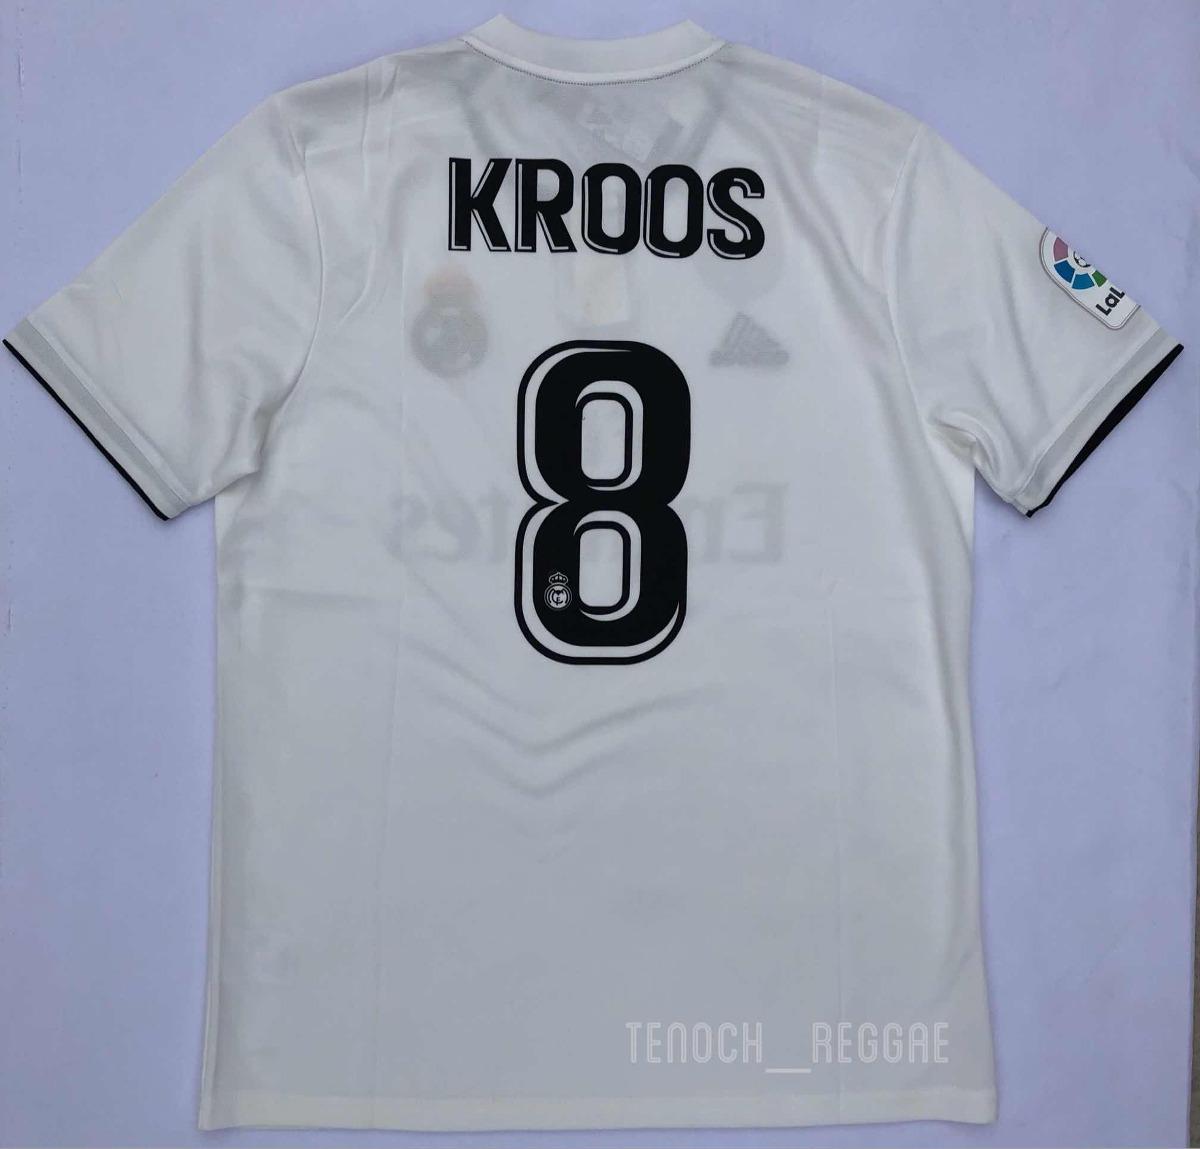 Jersey Playera Real Madrid Local 2018 2019 Kroos -   679.00 en ... 87905126a3fac